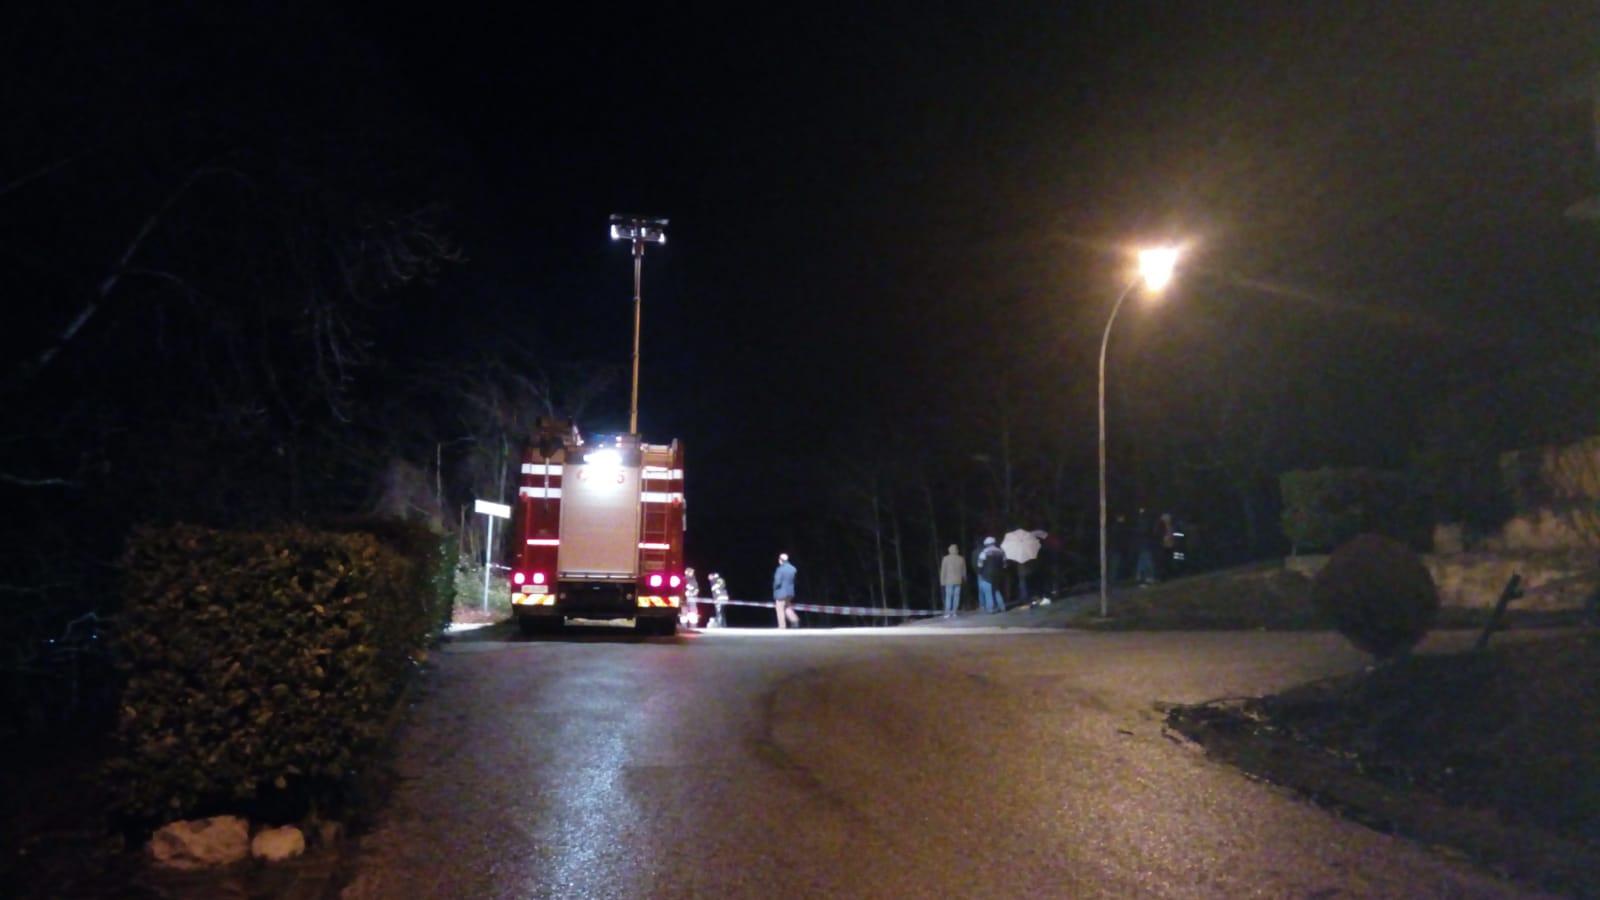 Frana a Canistro, chiusa una strada